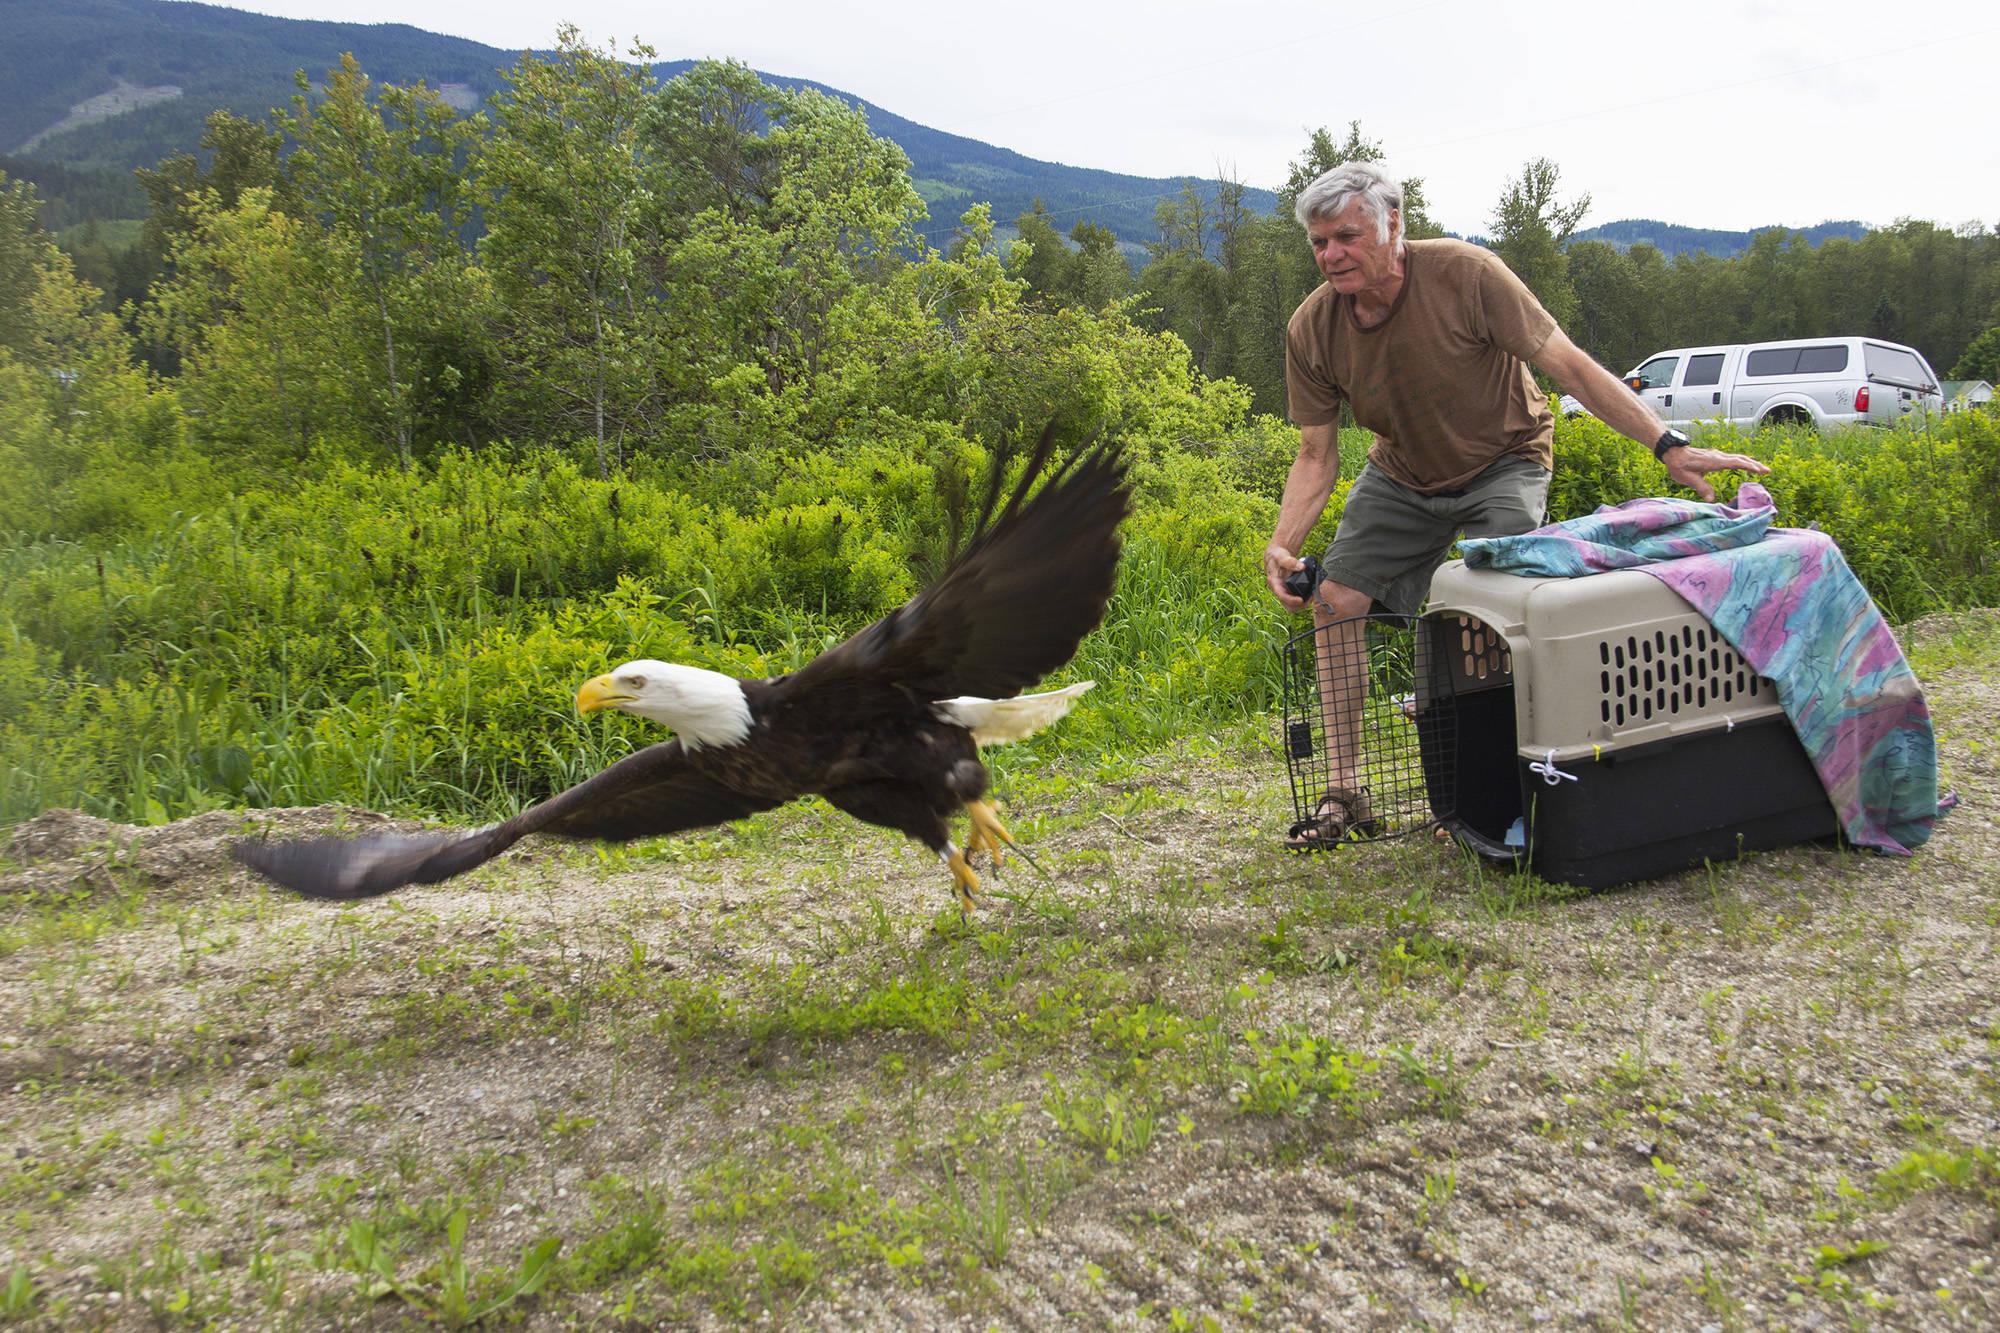 OWL rehabilitation society volunteer Gary Turner releases an injured bald eagle in Malakwa on Friday, June 5. (Jim Elliot/Eagle Valley News)